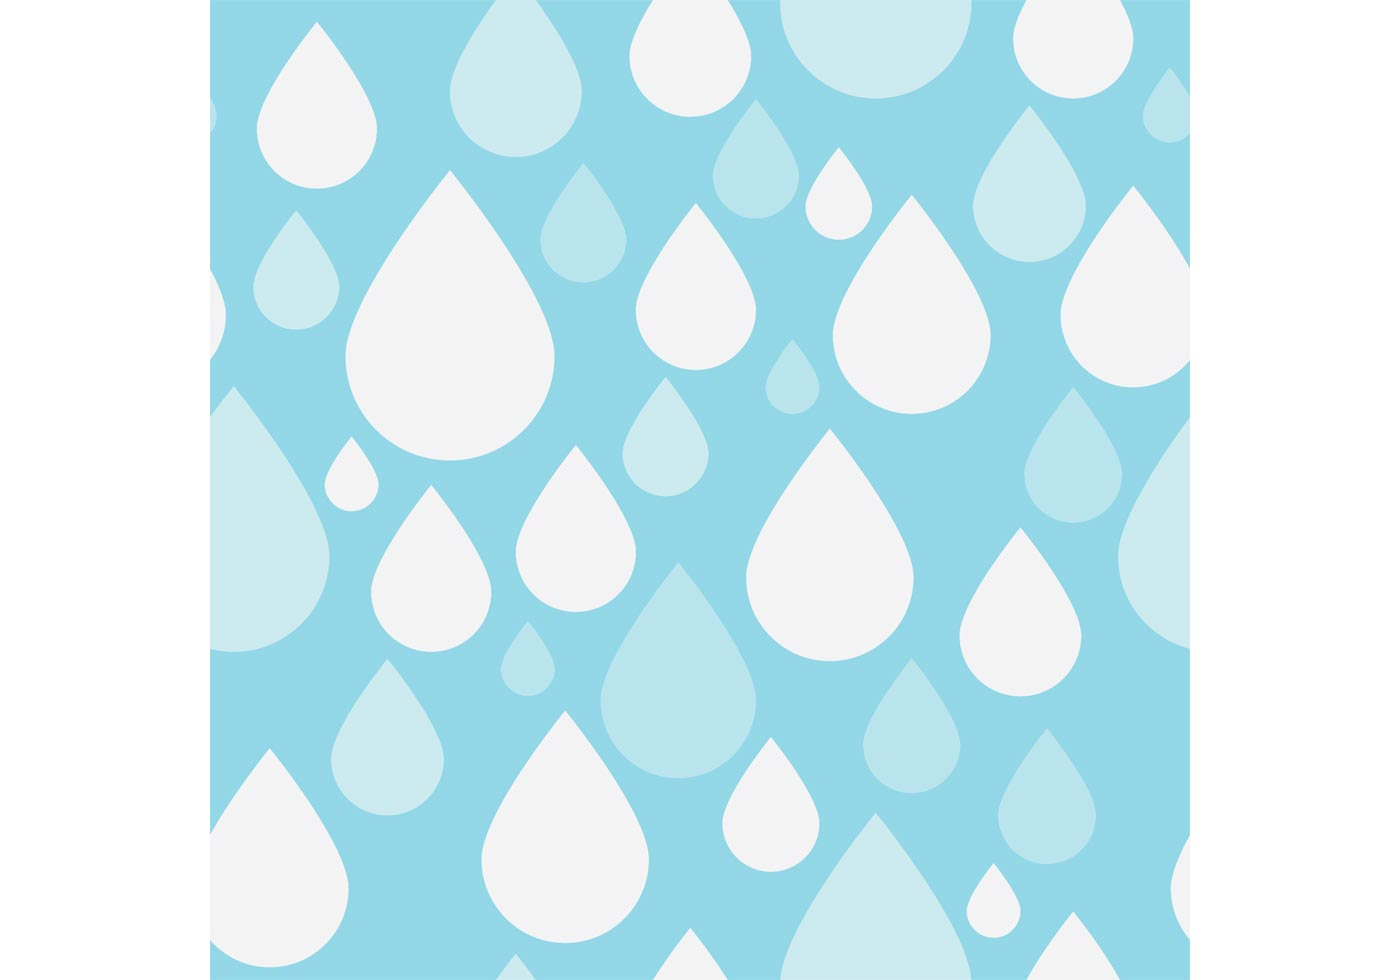 Drops Patterns Cool Ideas